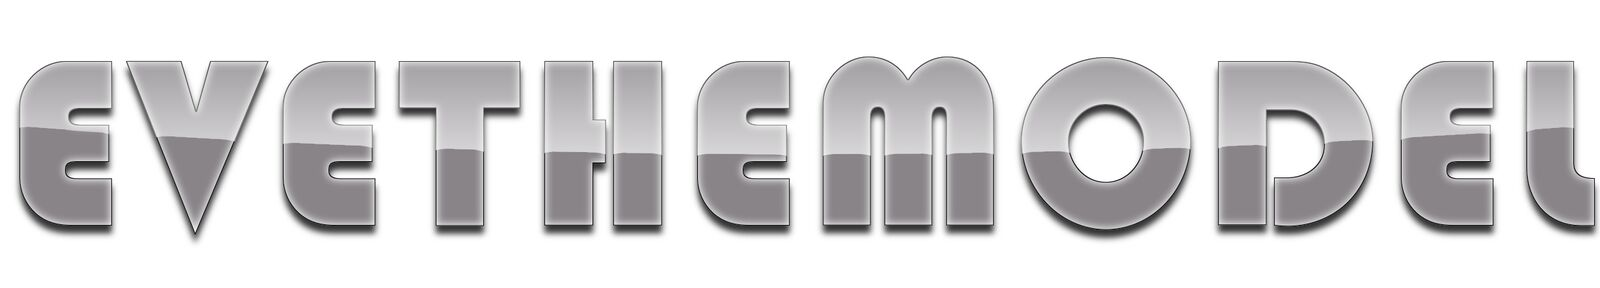 EveTheModel